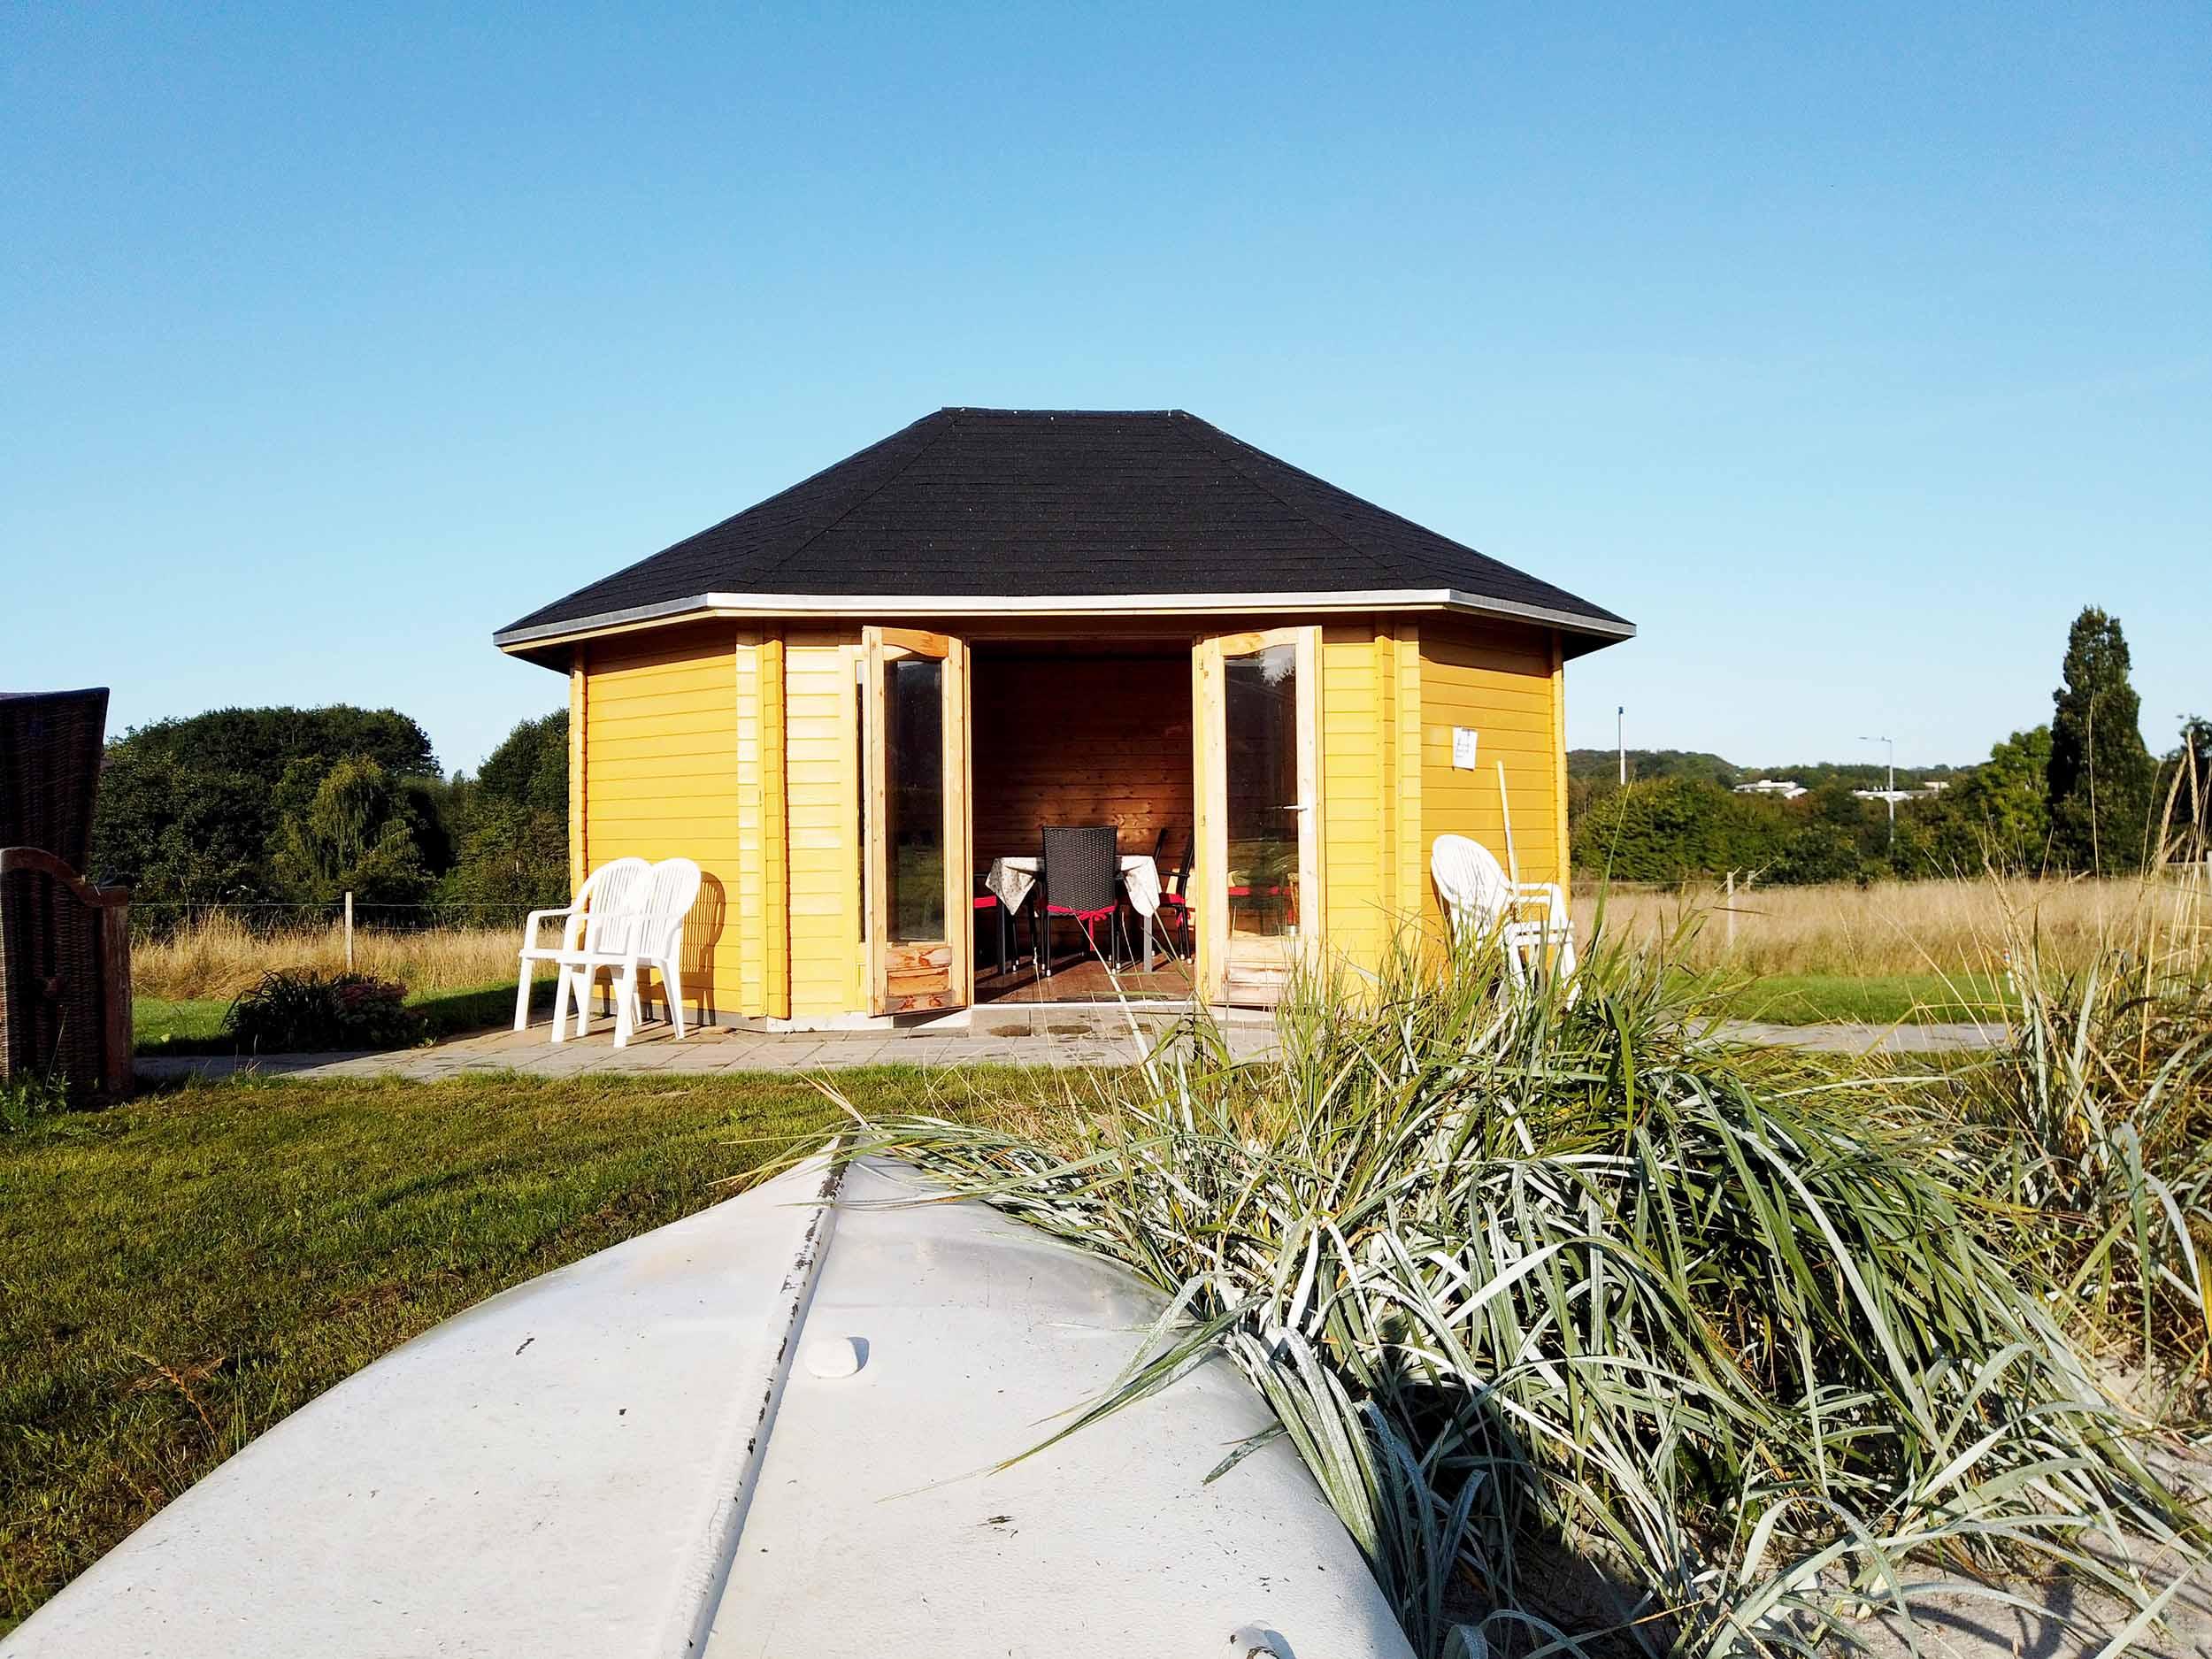 Besøgs pavillon fra Sølund